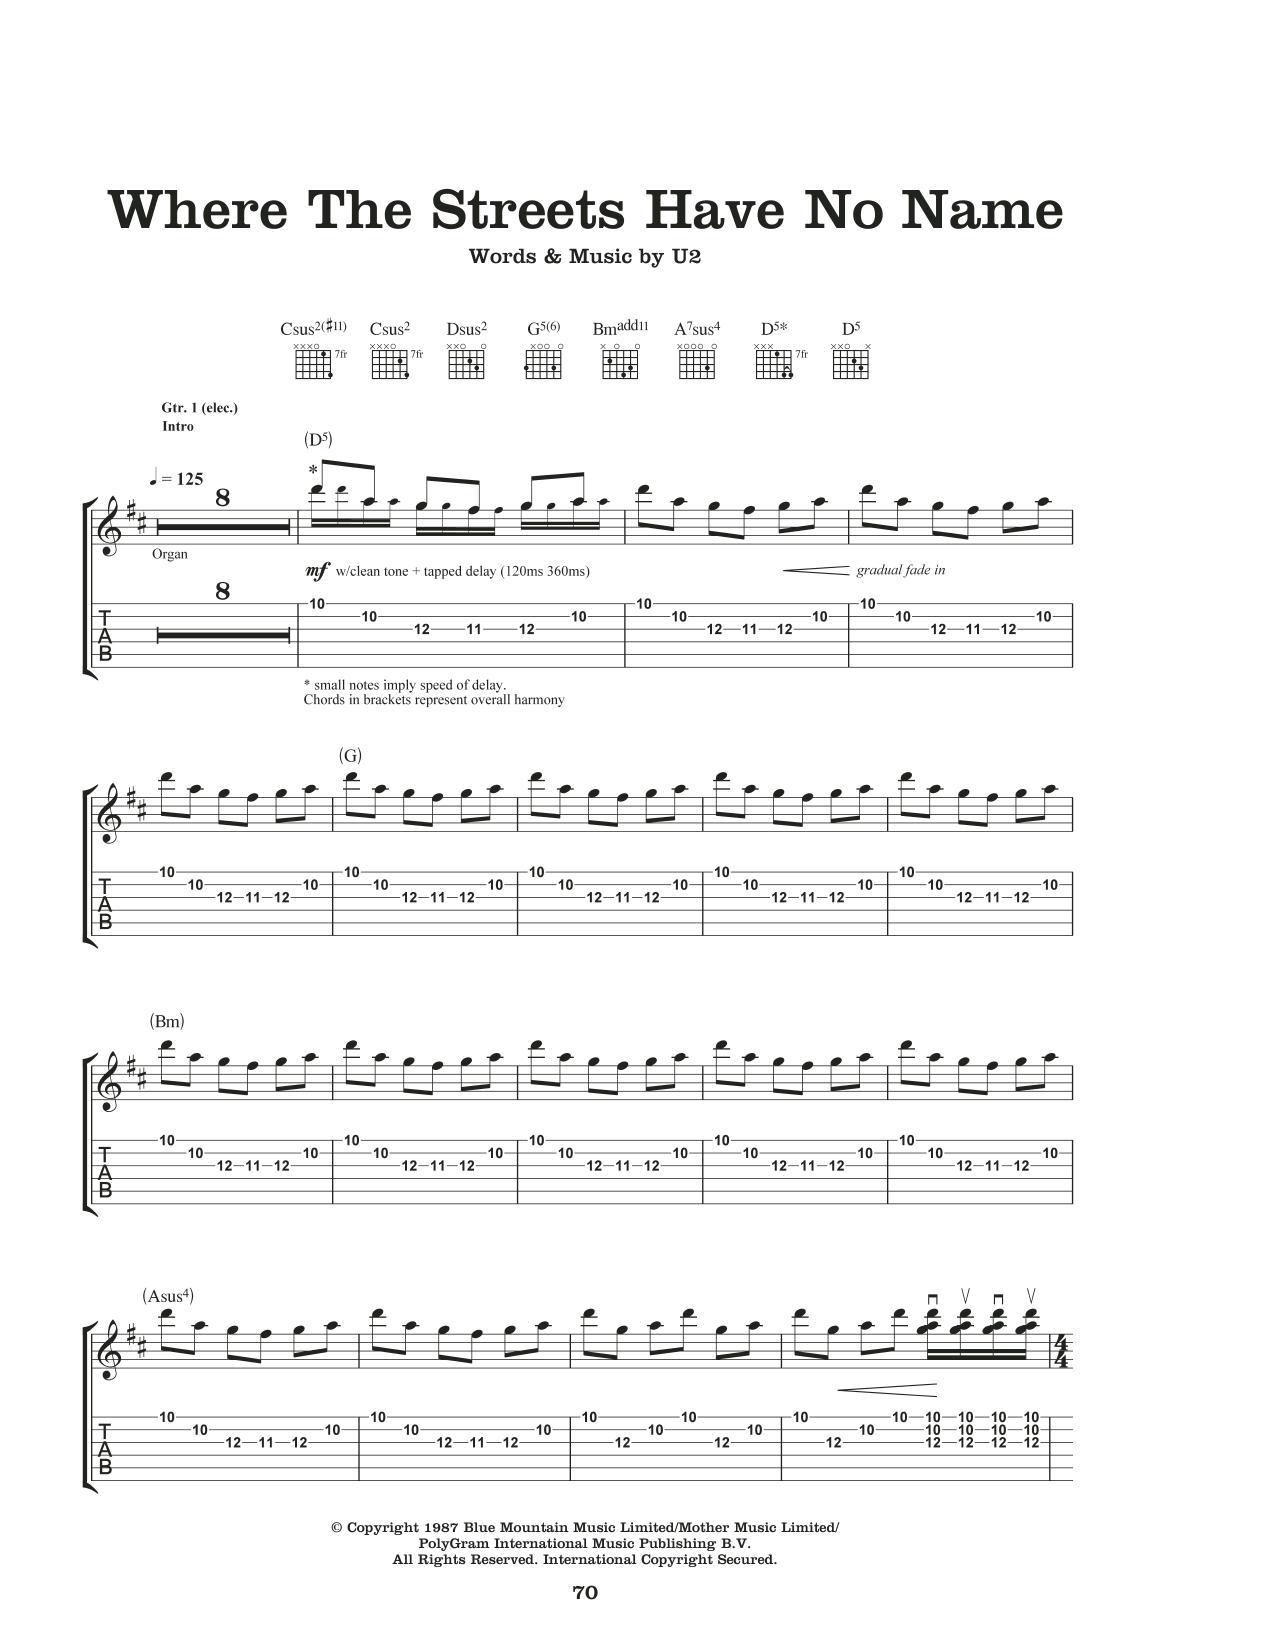 Where The Streets Have No Name Sheet Music U2 Guitar Tab